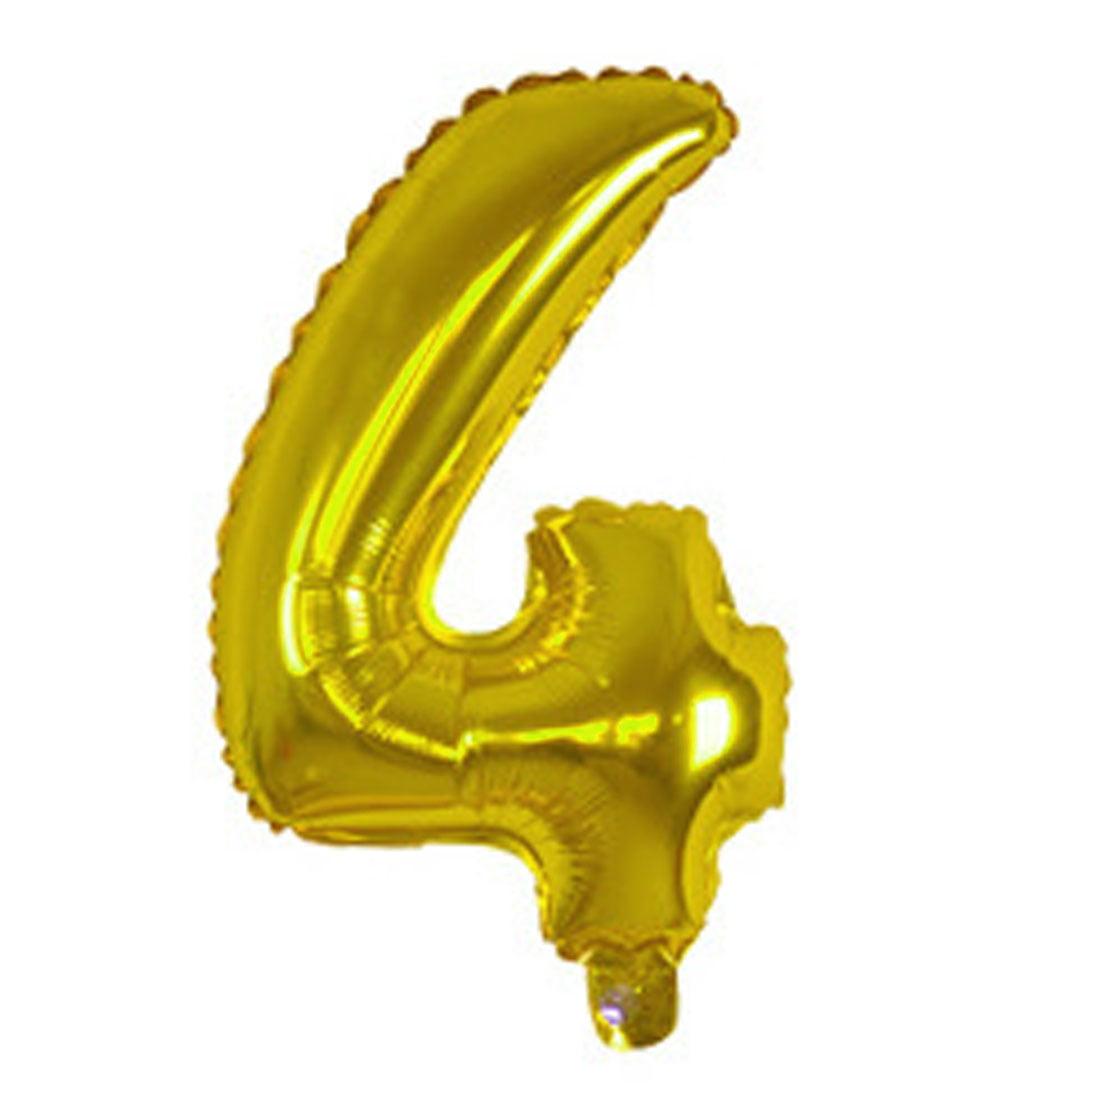 "Unique Bargains Foil Number 4 Shape Helium Balloon Birthday Wedding Decor Gold Tone 16"""